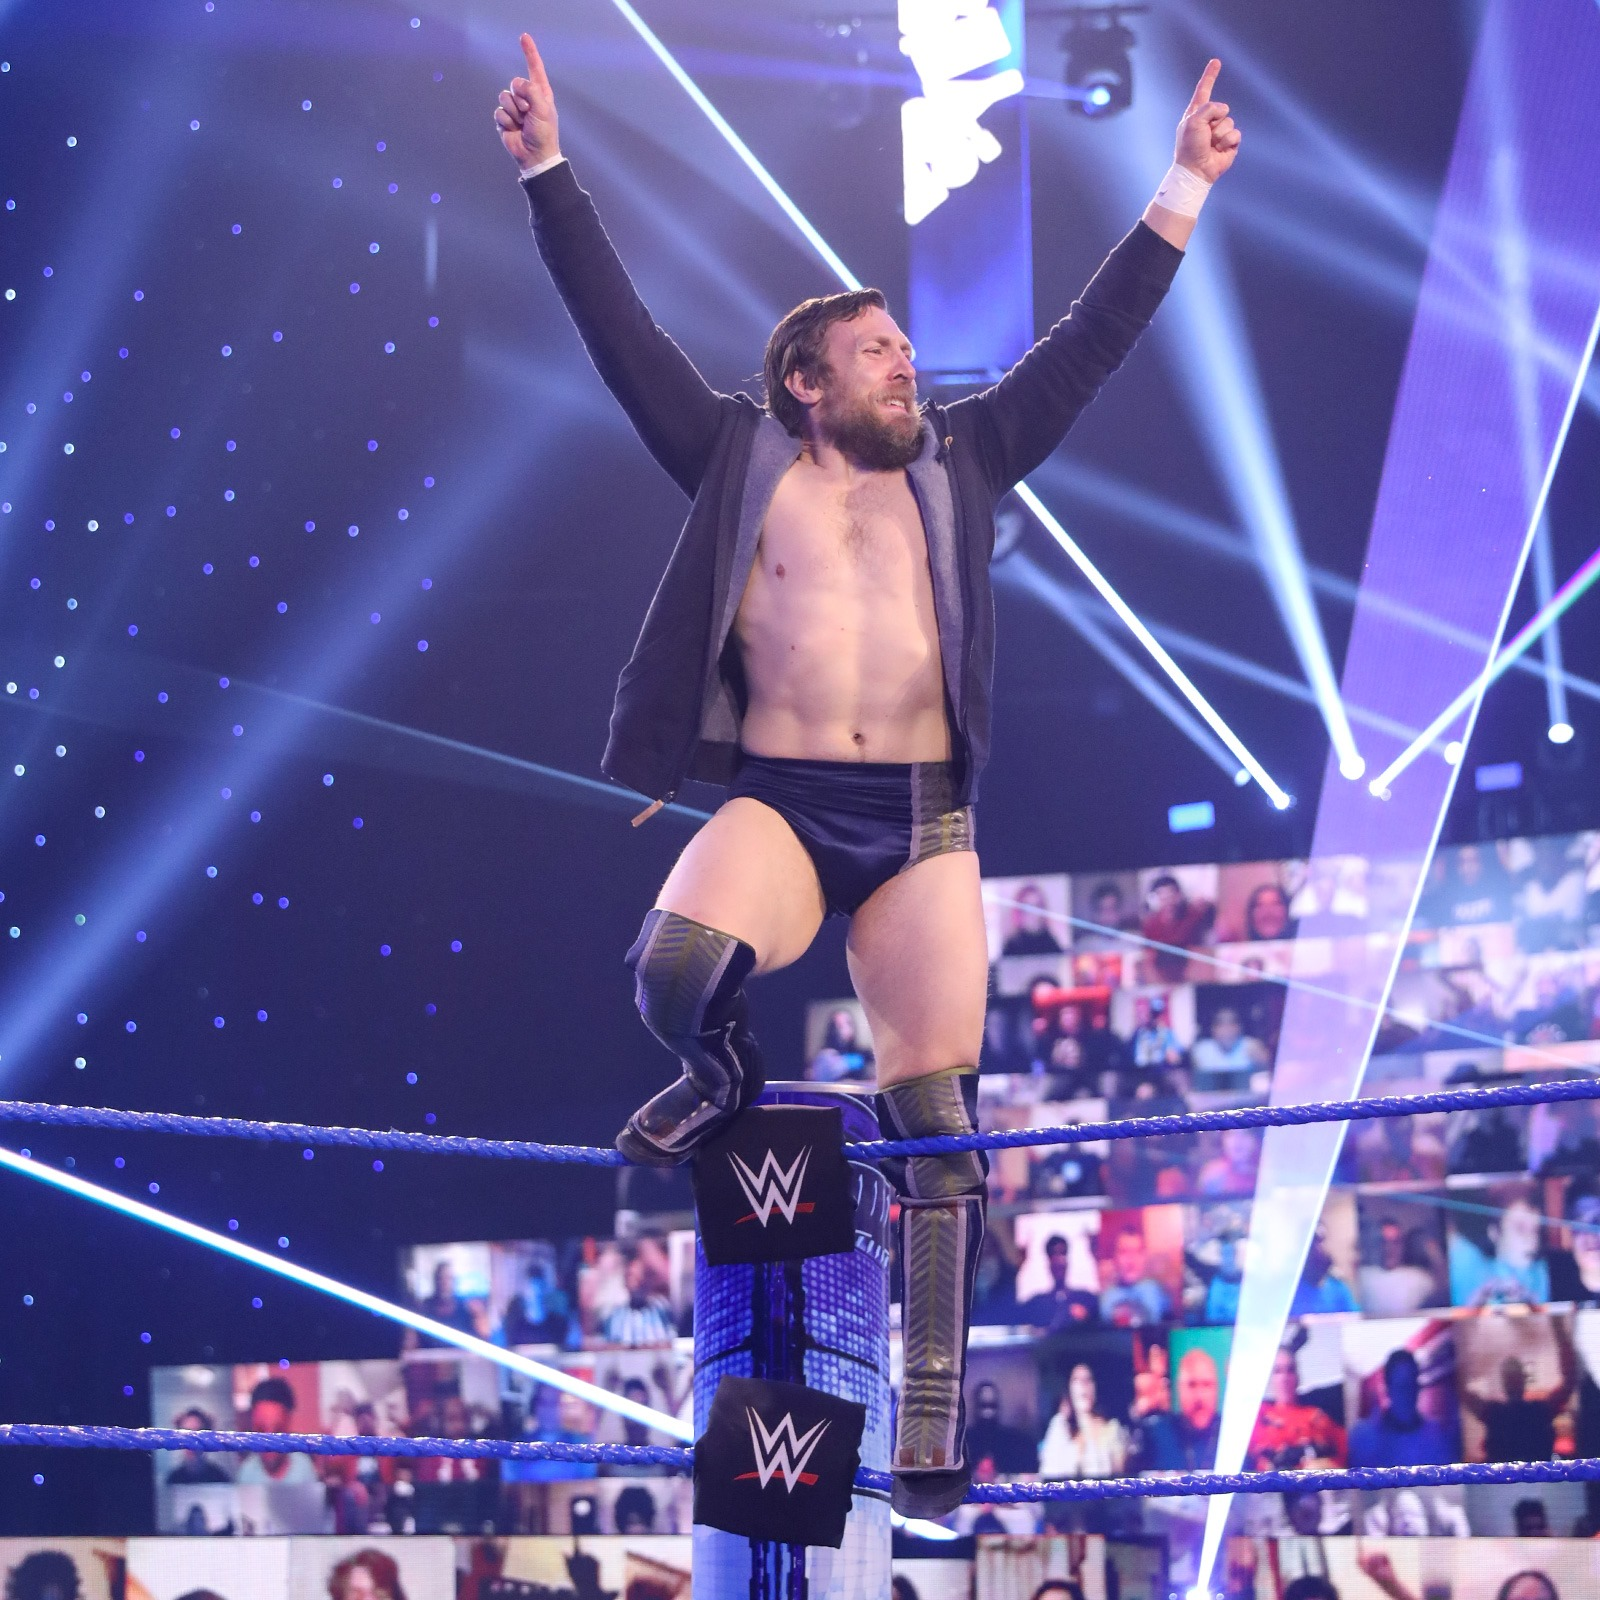 Así usa Daniel Bryan su influencia tras bambalinas de WWE     Superluchas